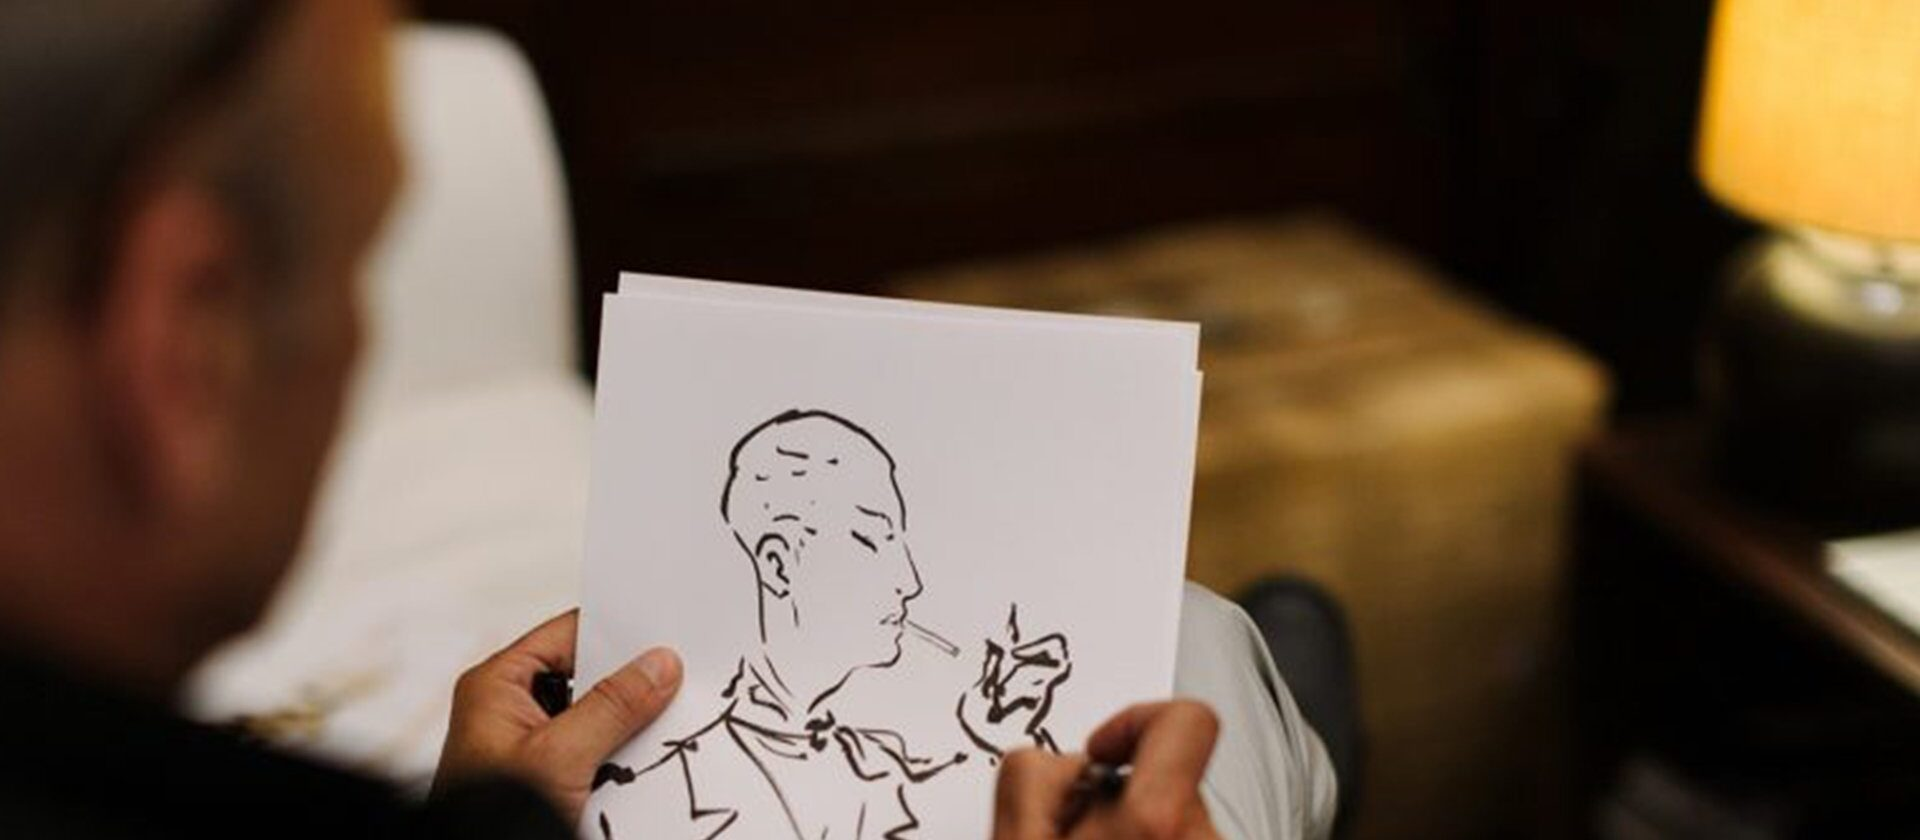 Italian Illustrator Andrea Ferolla doing a drawing of a man smoking